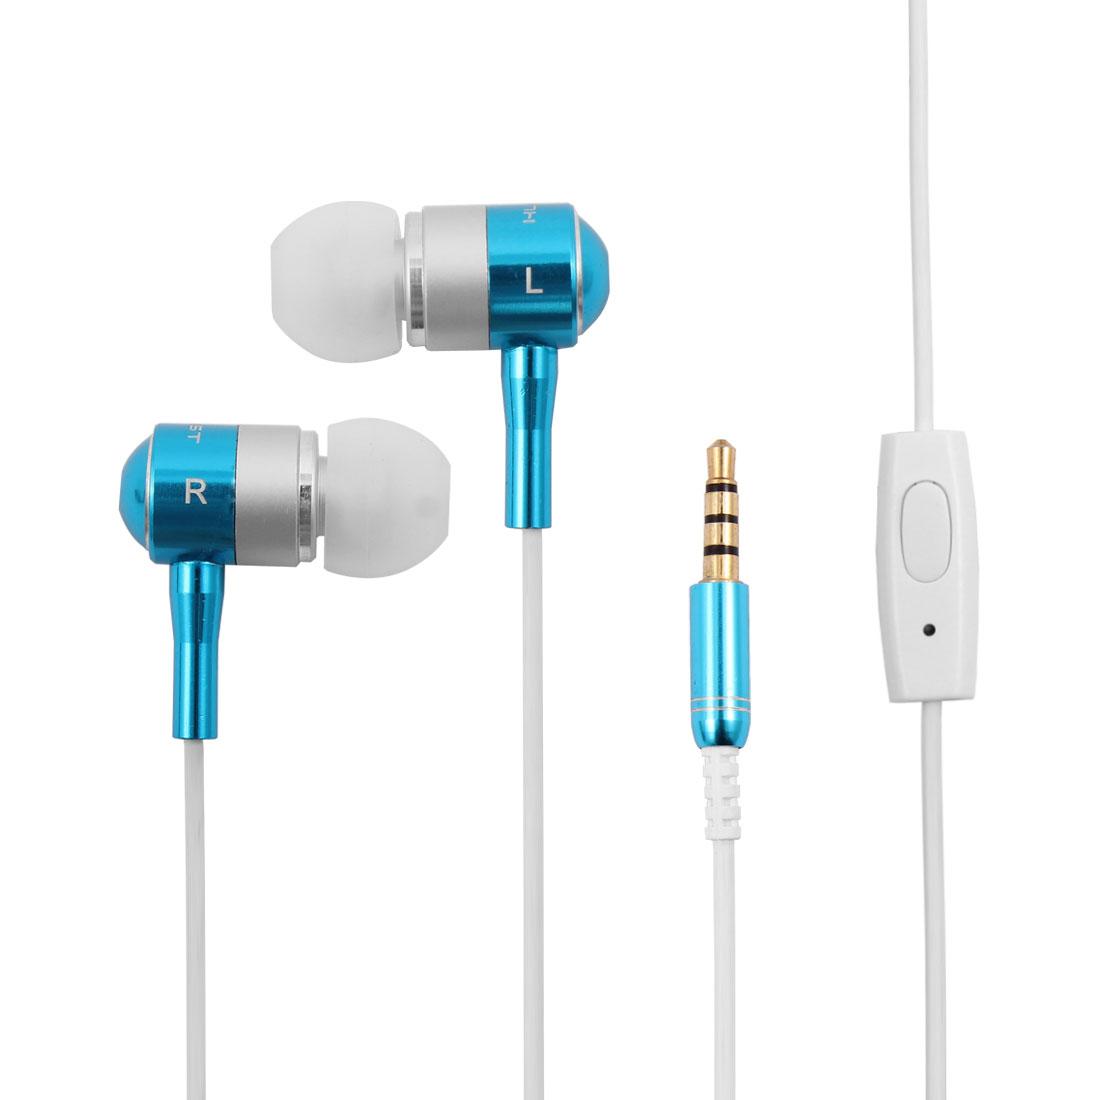 3.5mm Jack In-Ear Earbuds Headset Music Stereo Earphone Teal Blue w Microphone